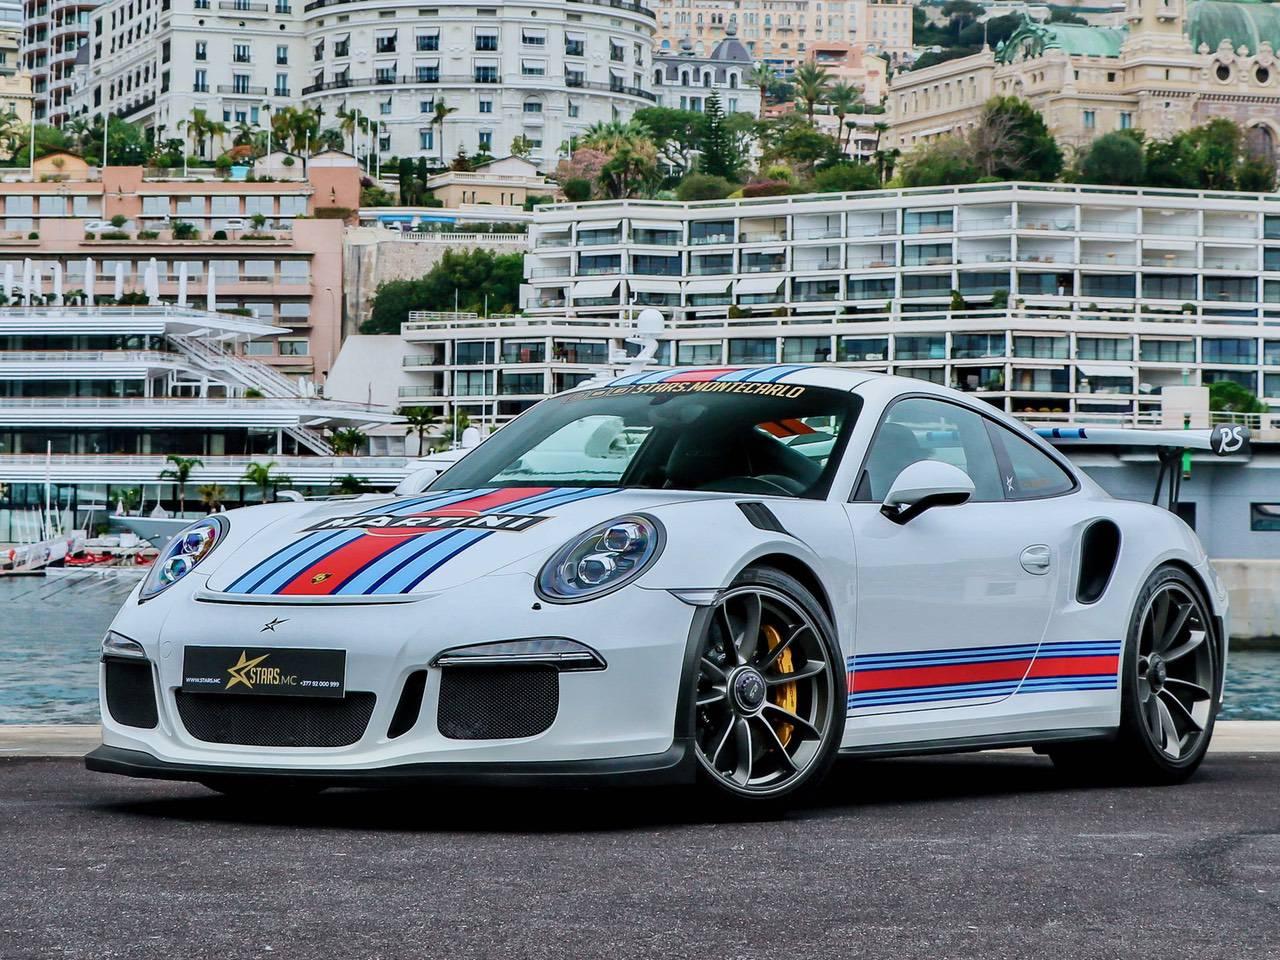 Porsche-991-Coupè-991-PDK-GT3-RS-Martini-0